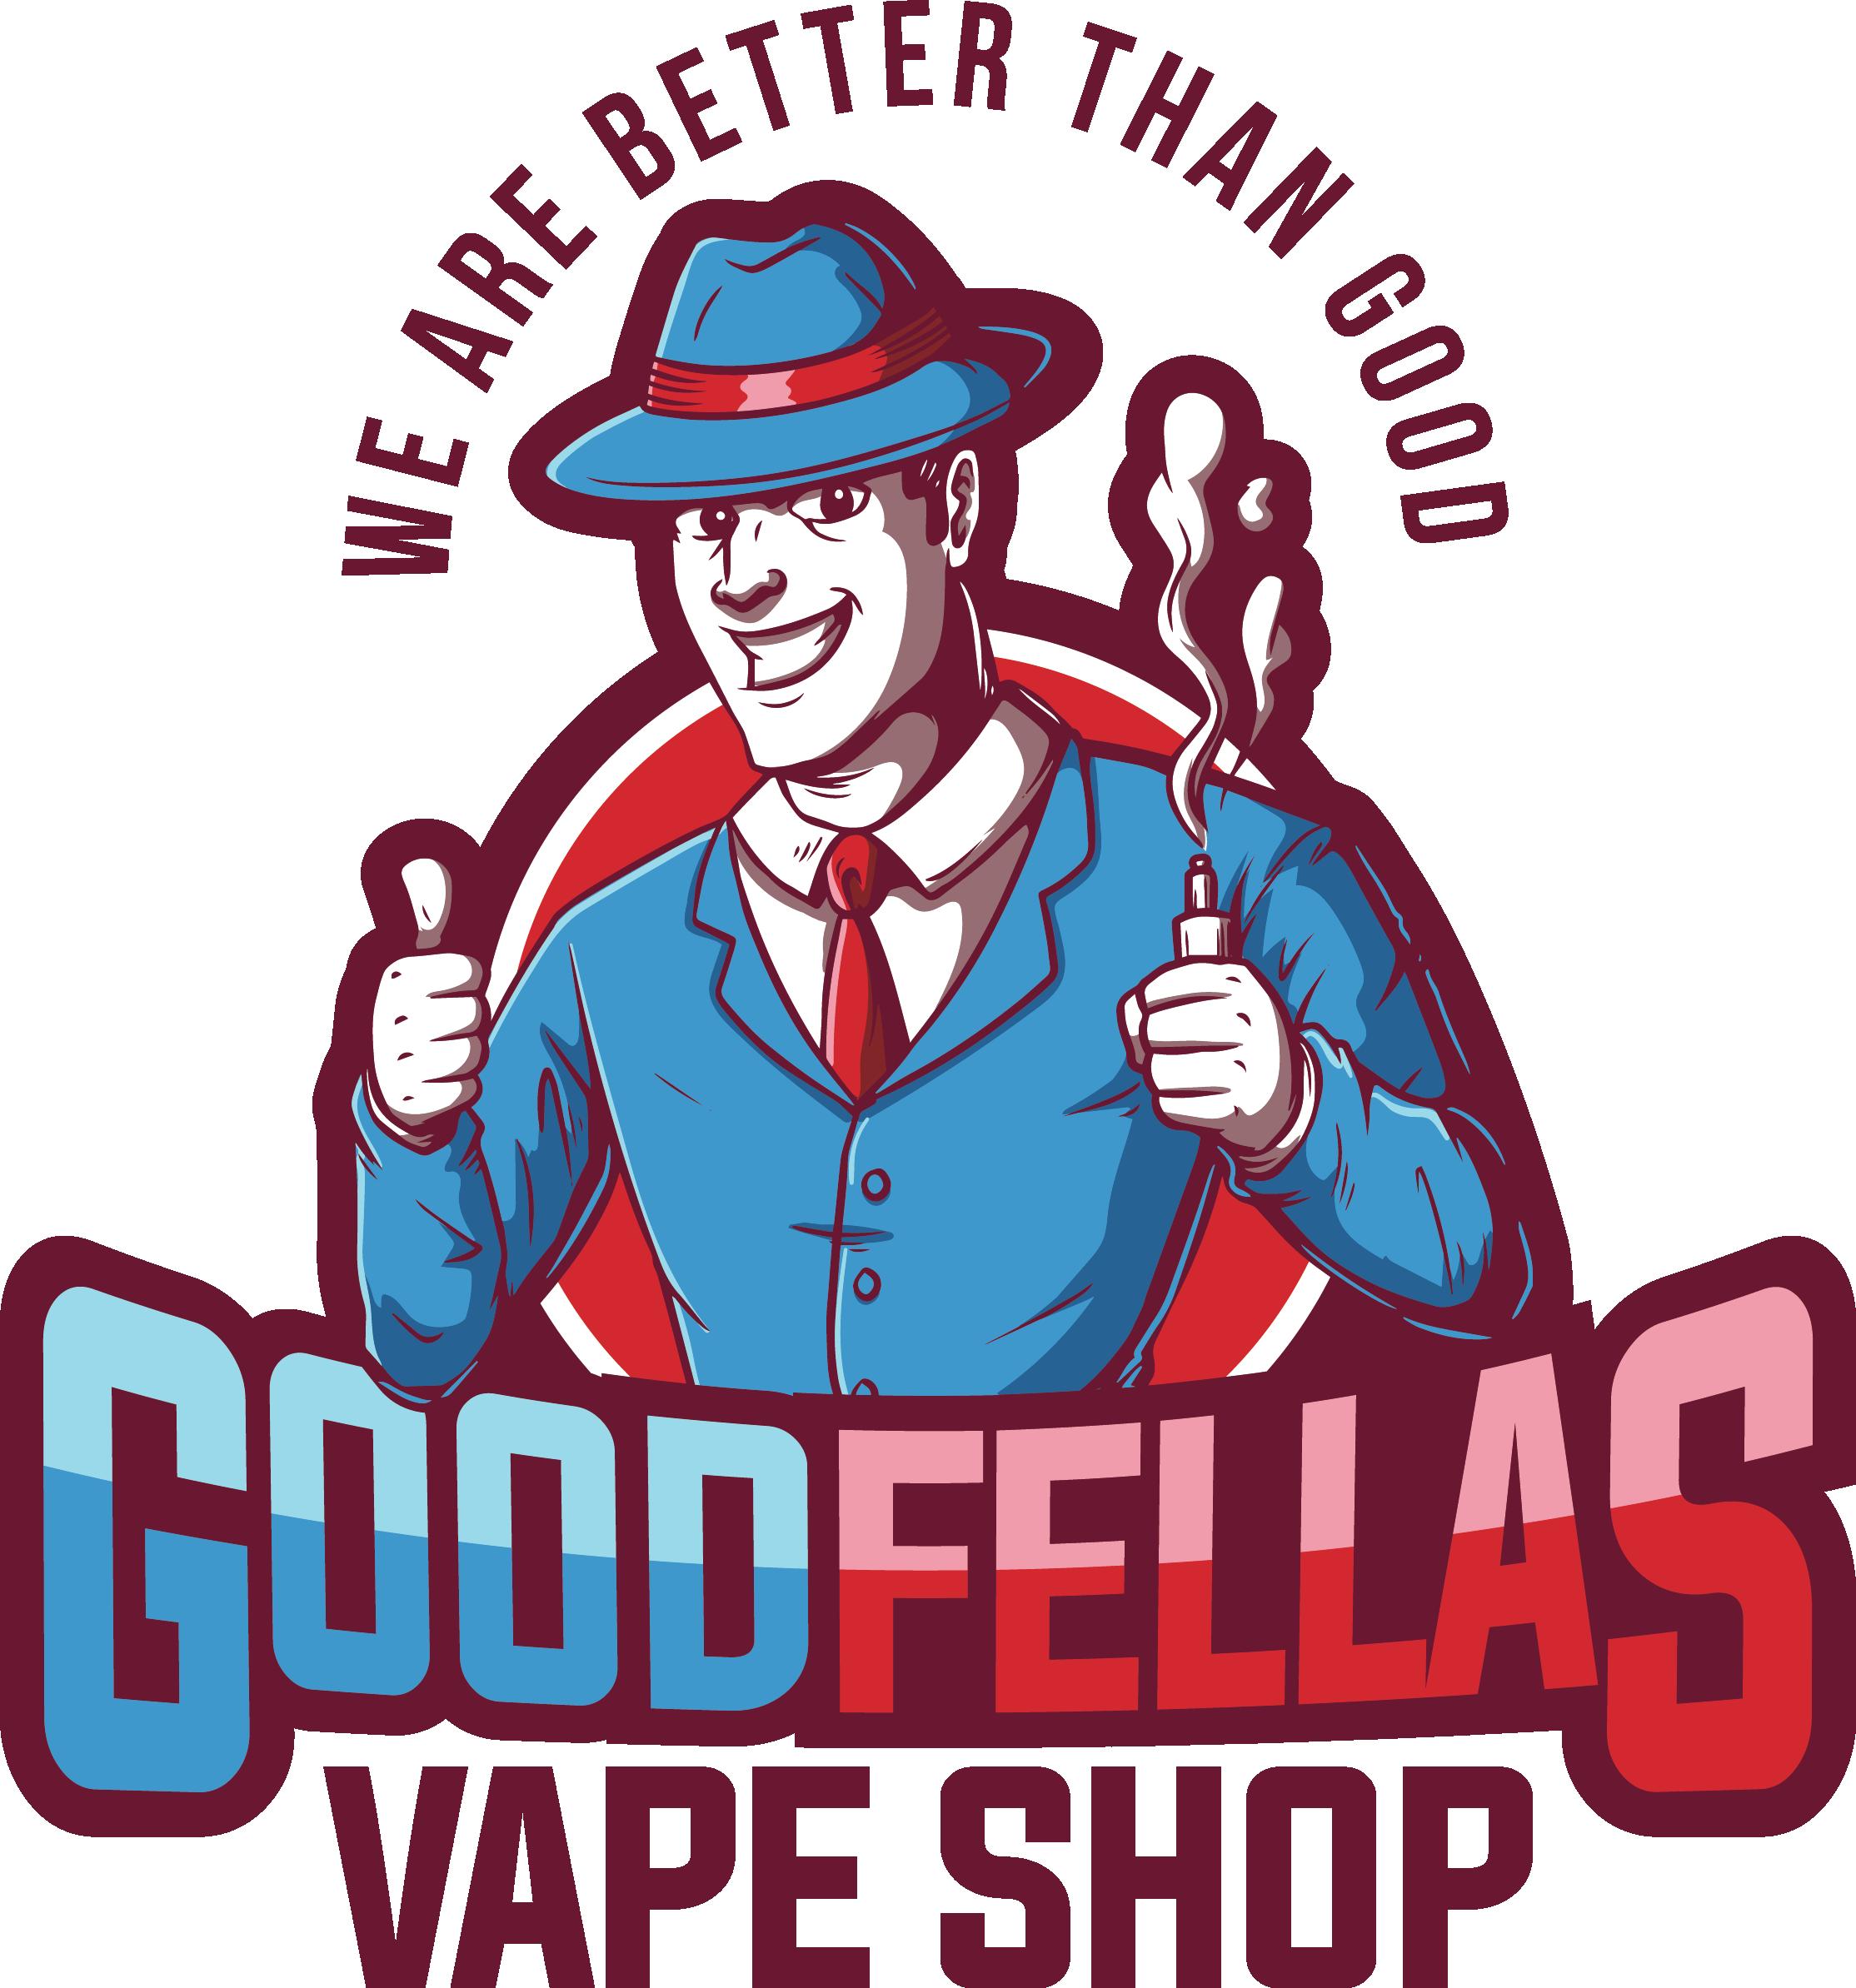 GoodFellas Vape Shop Logo Design